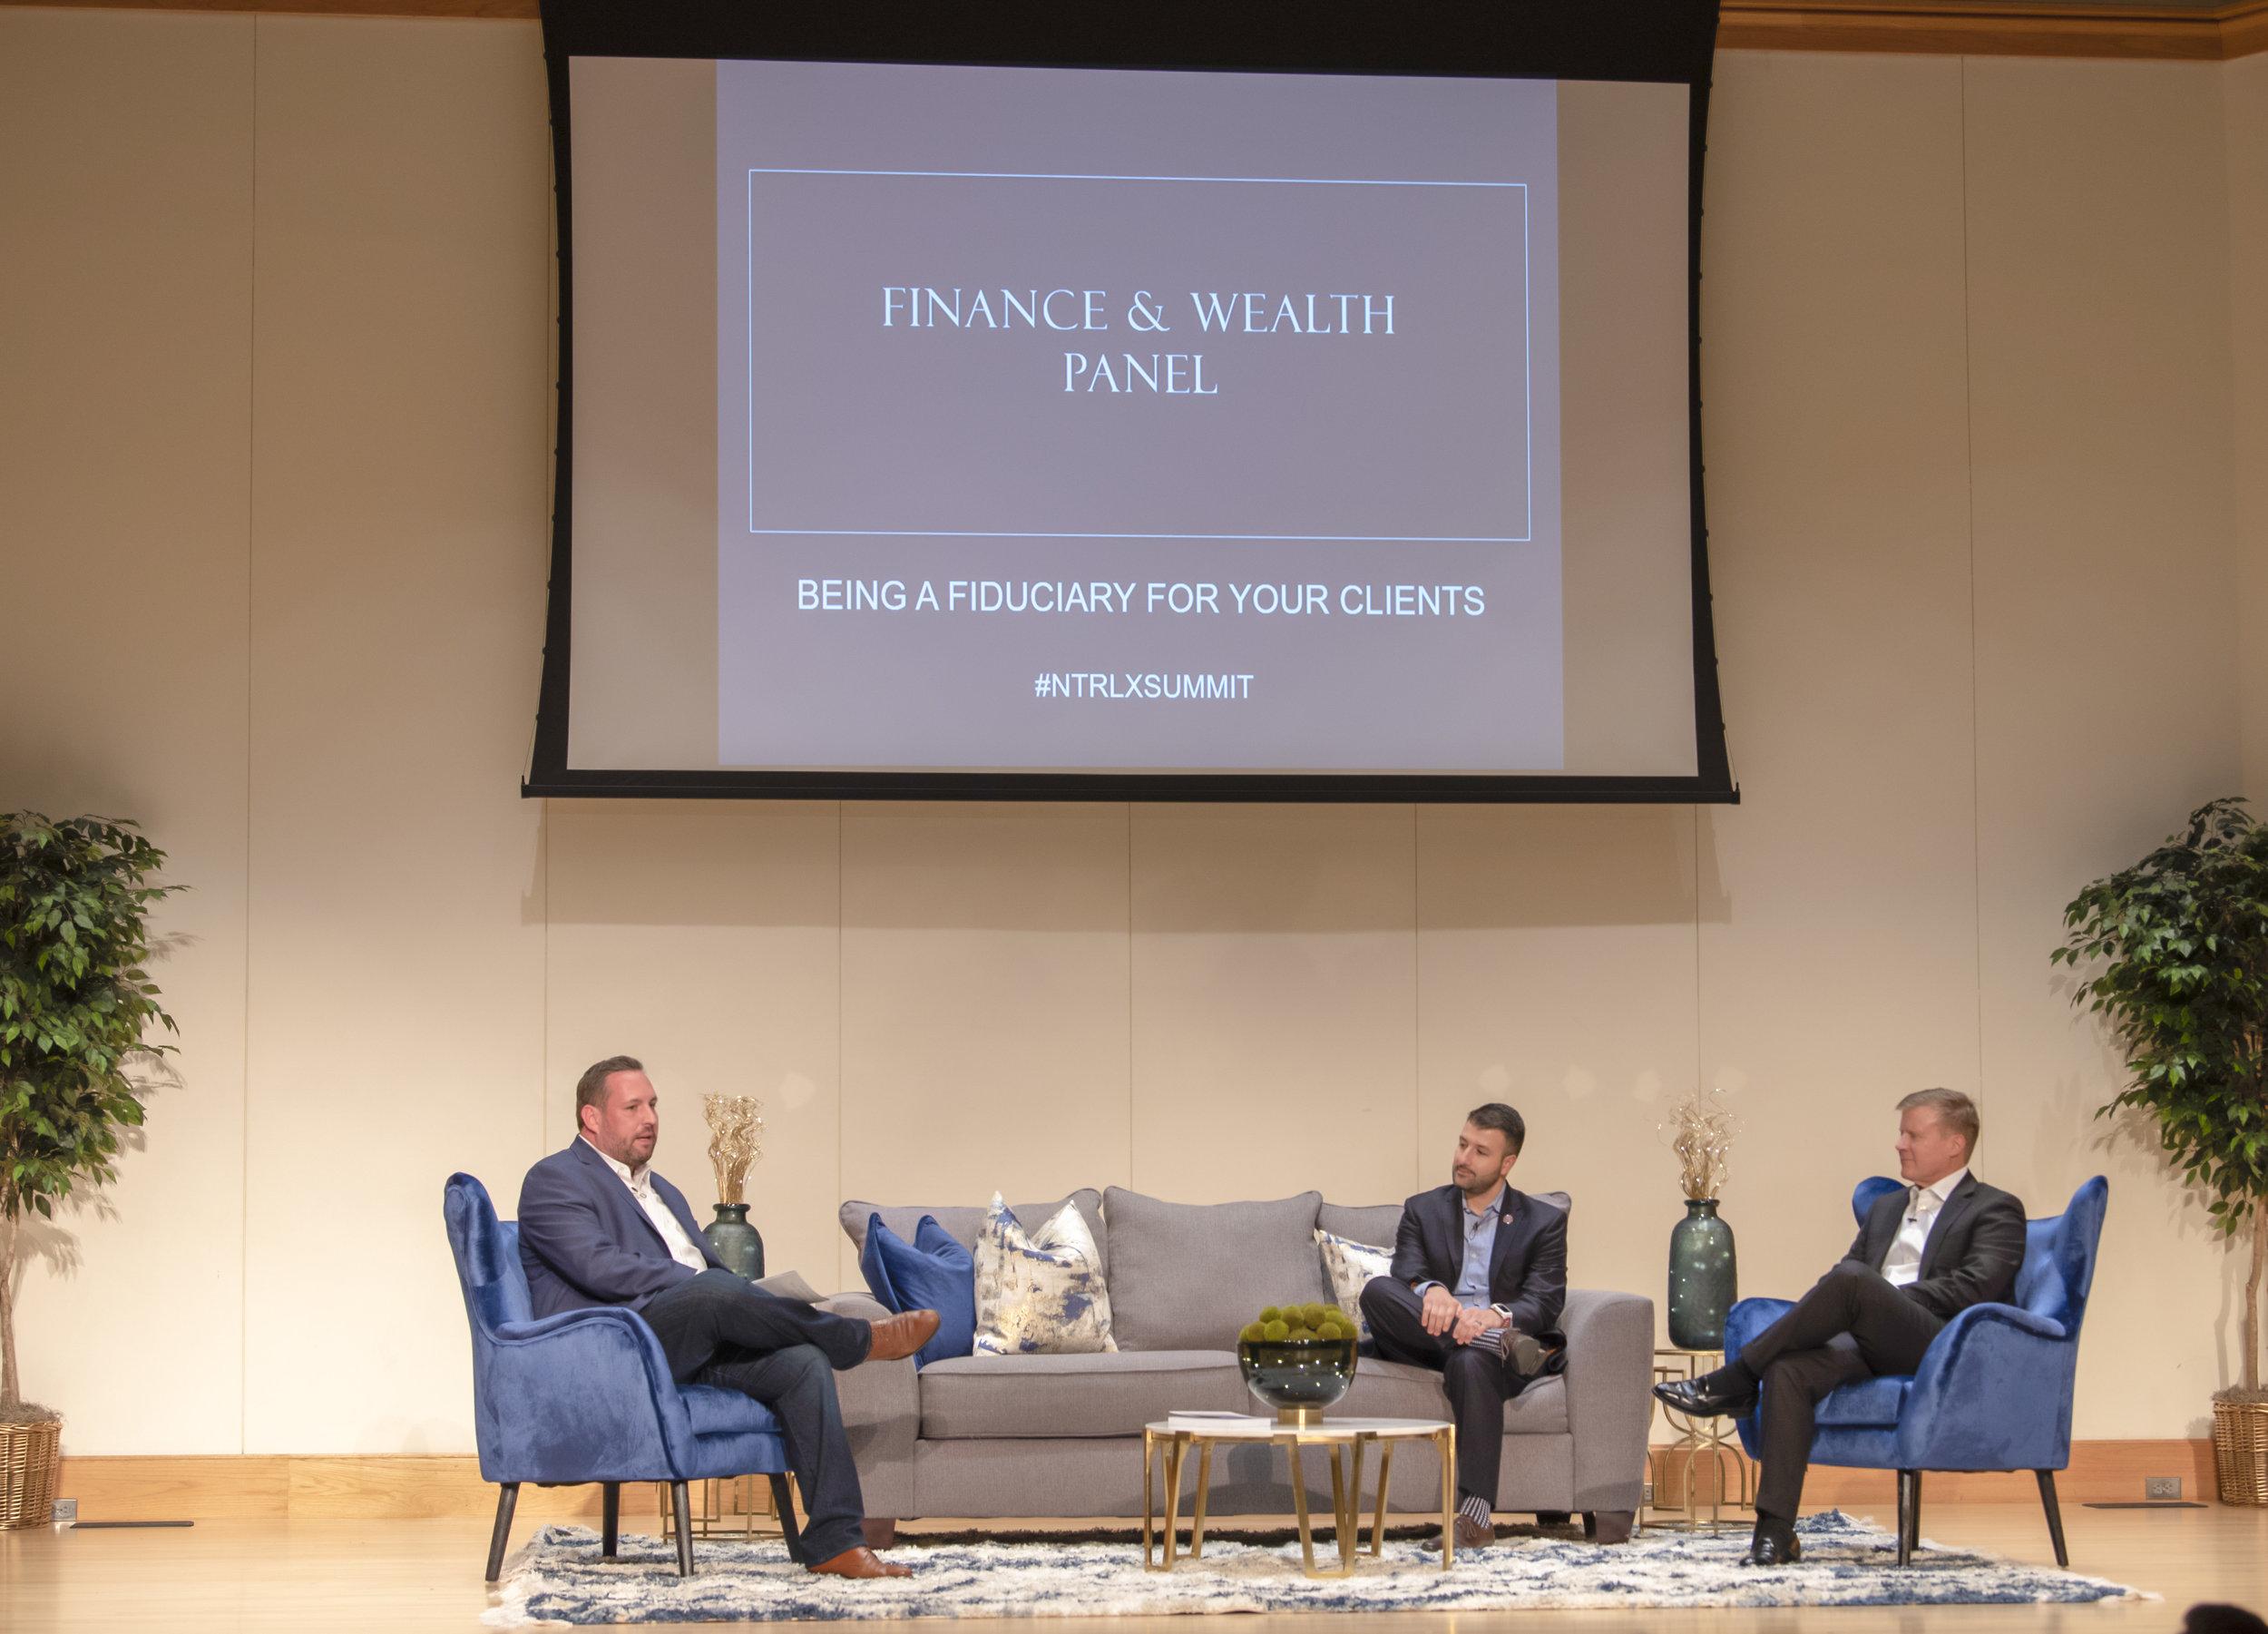 Finance & Wealth Panel